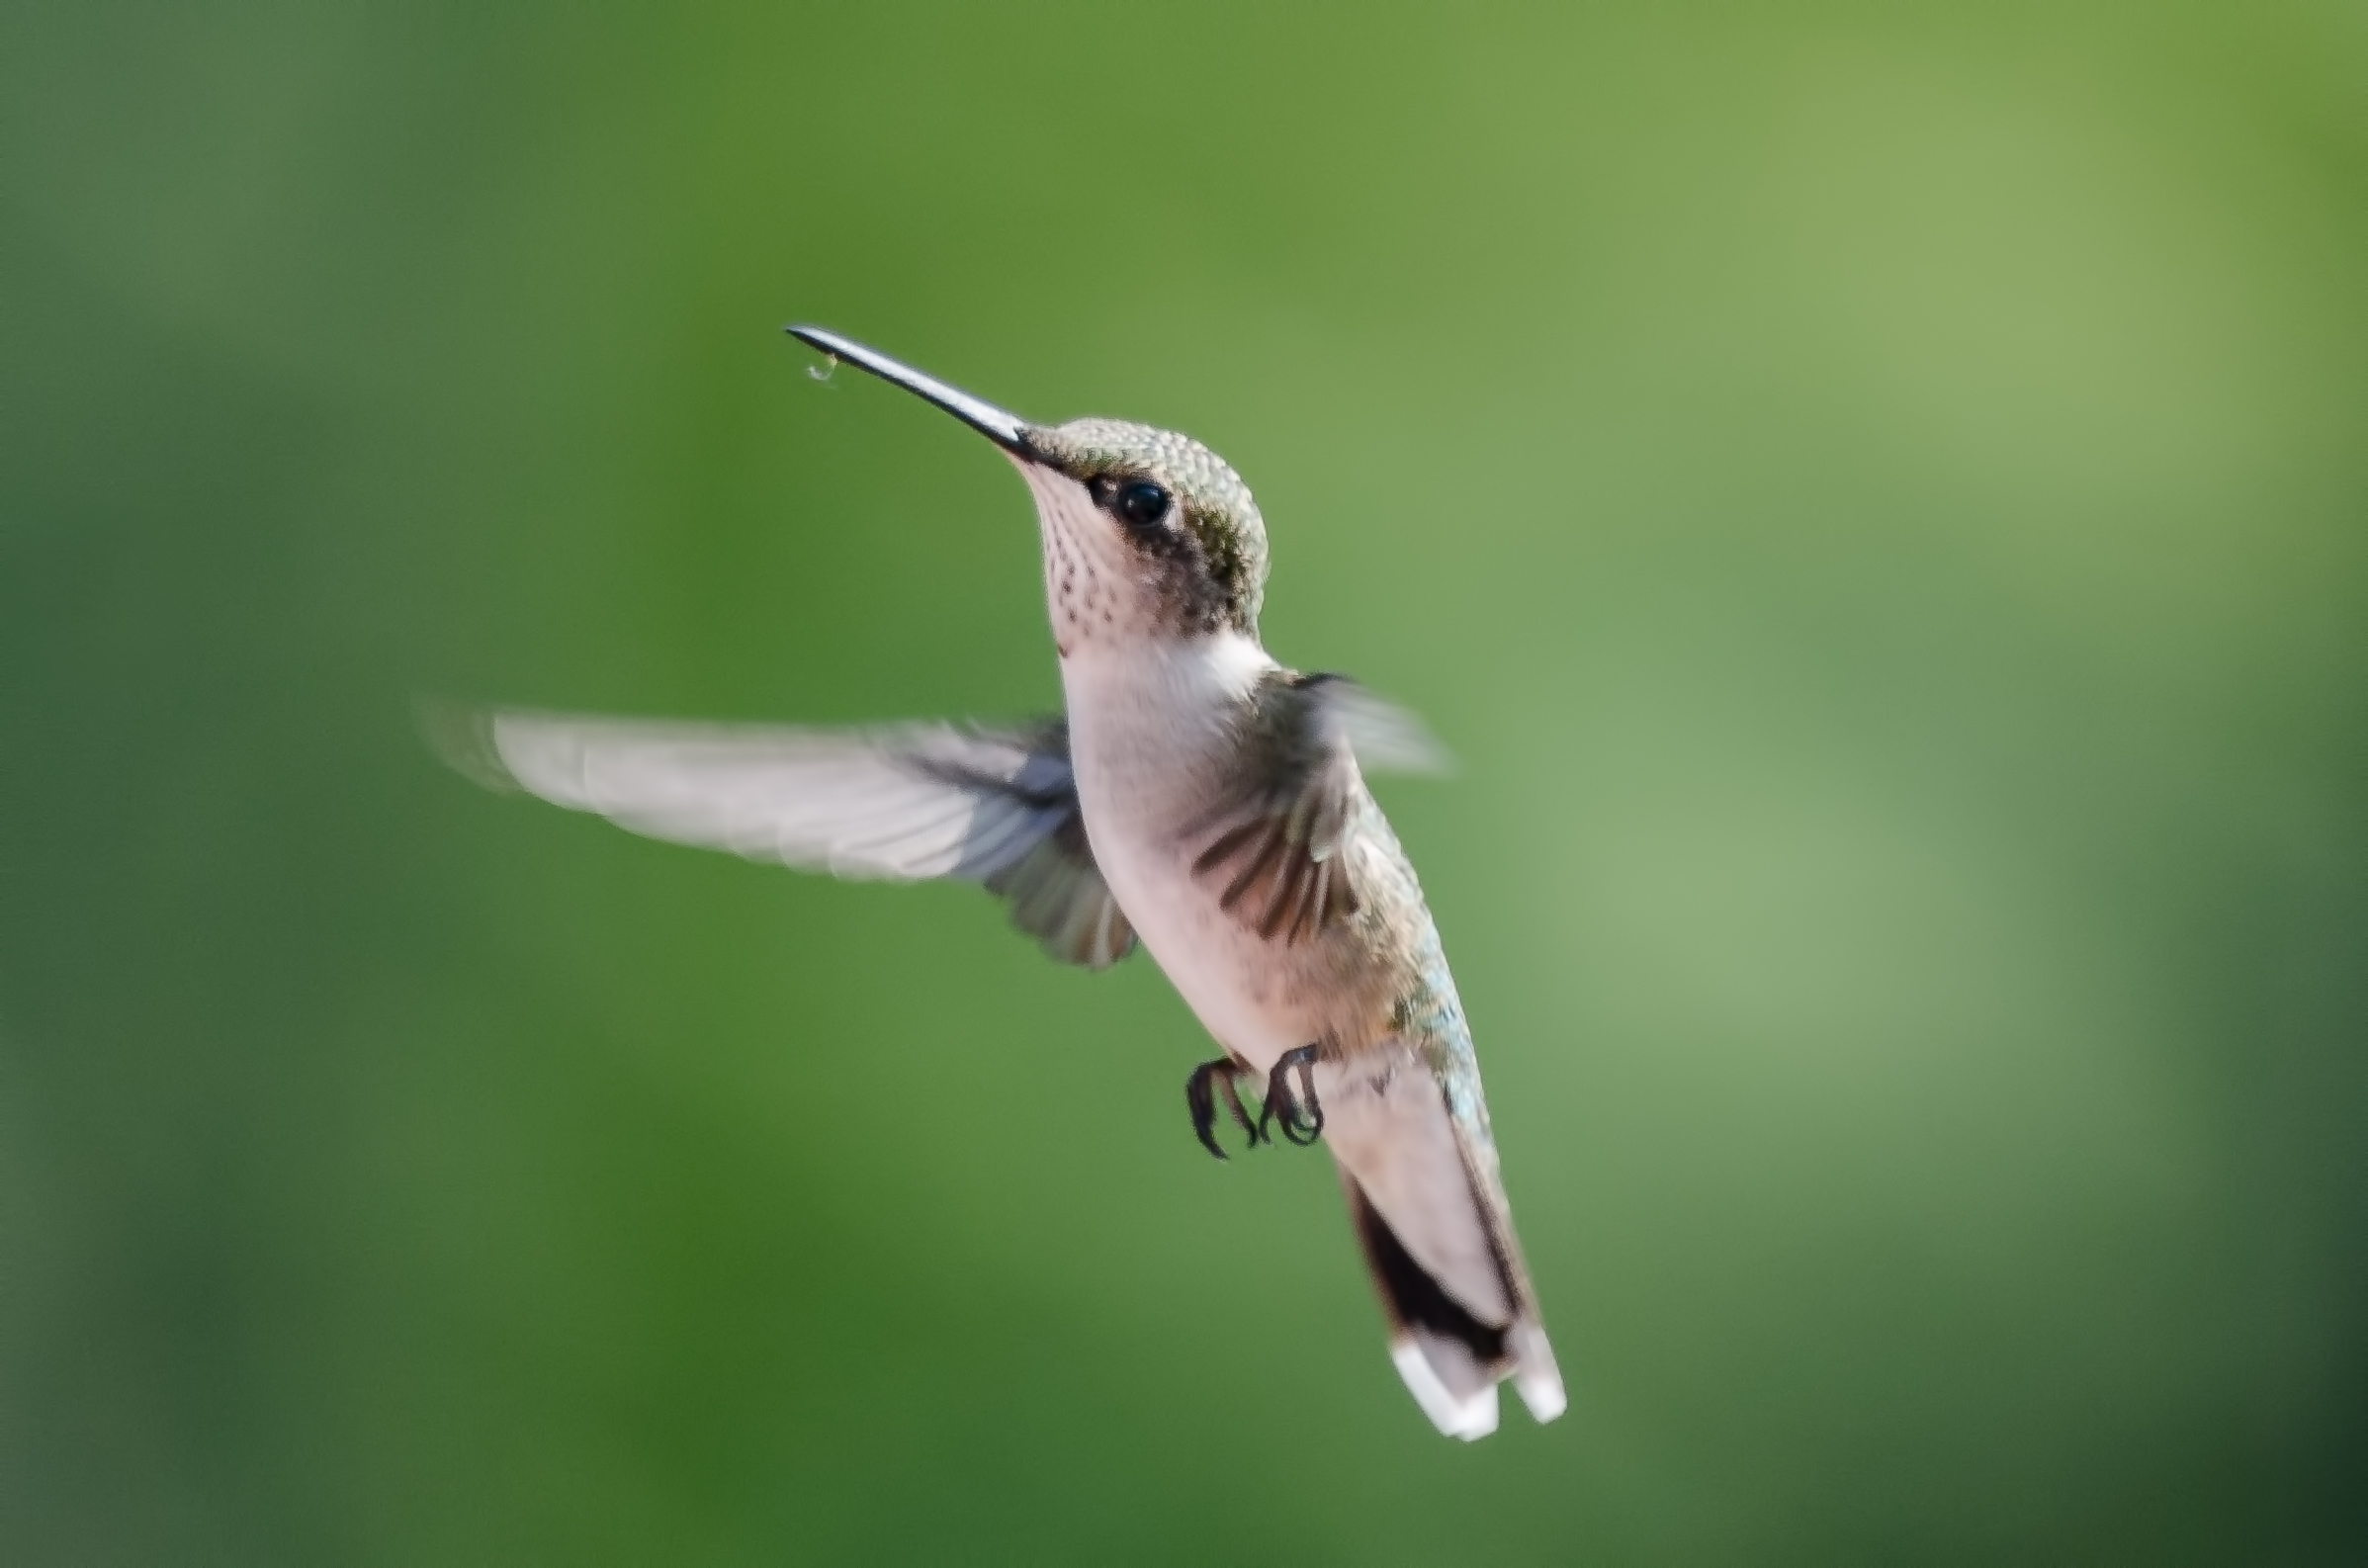 Ruby-Throated Hummingbird Nikon D7000 ISO 400 600mm f/8 1/500 sec.